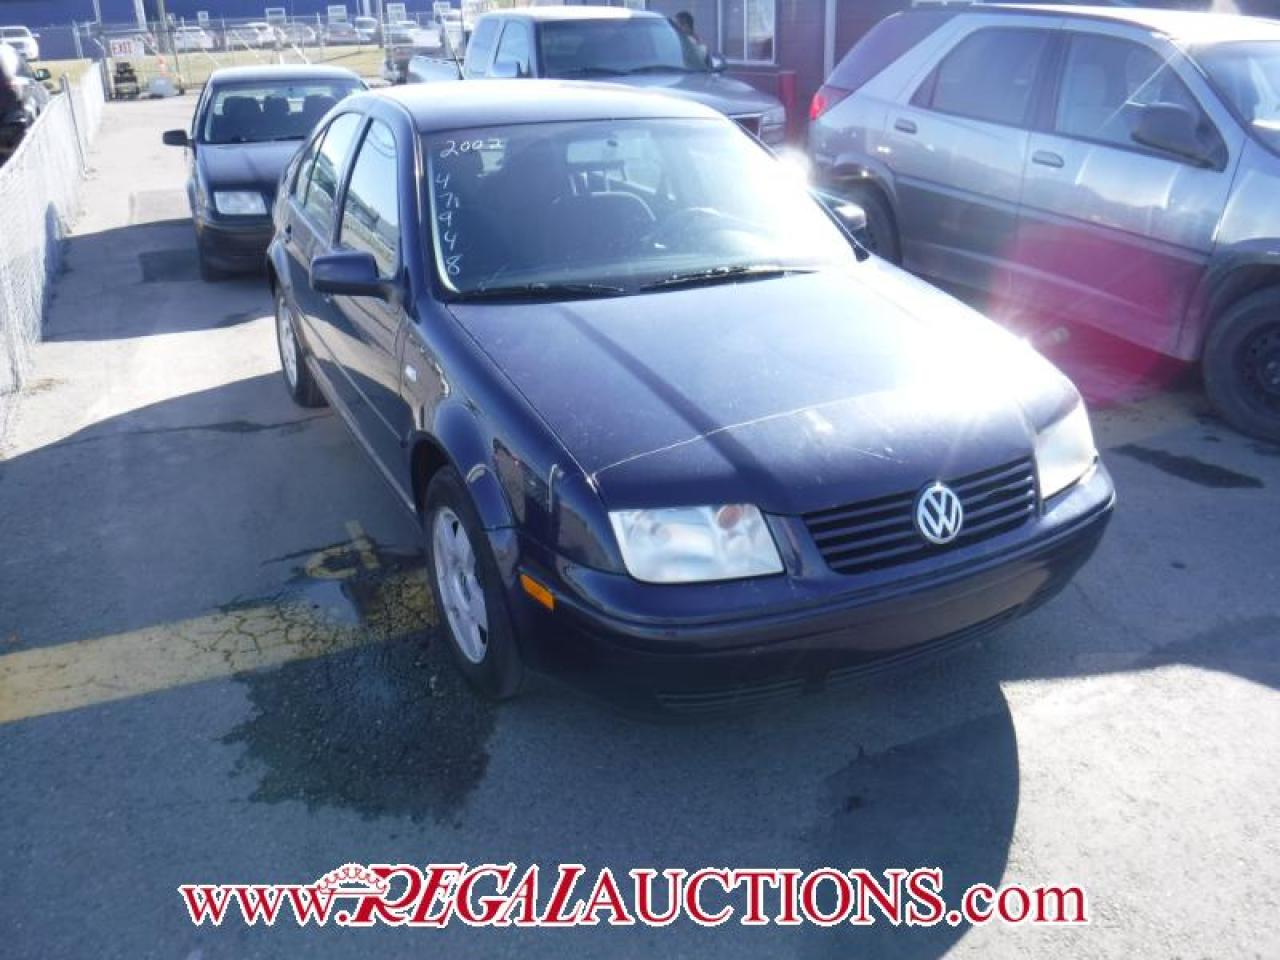 Photo of Blue 2002 Volkswagen Jetta